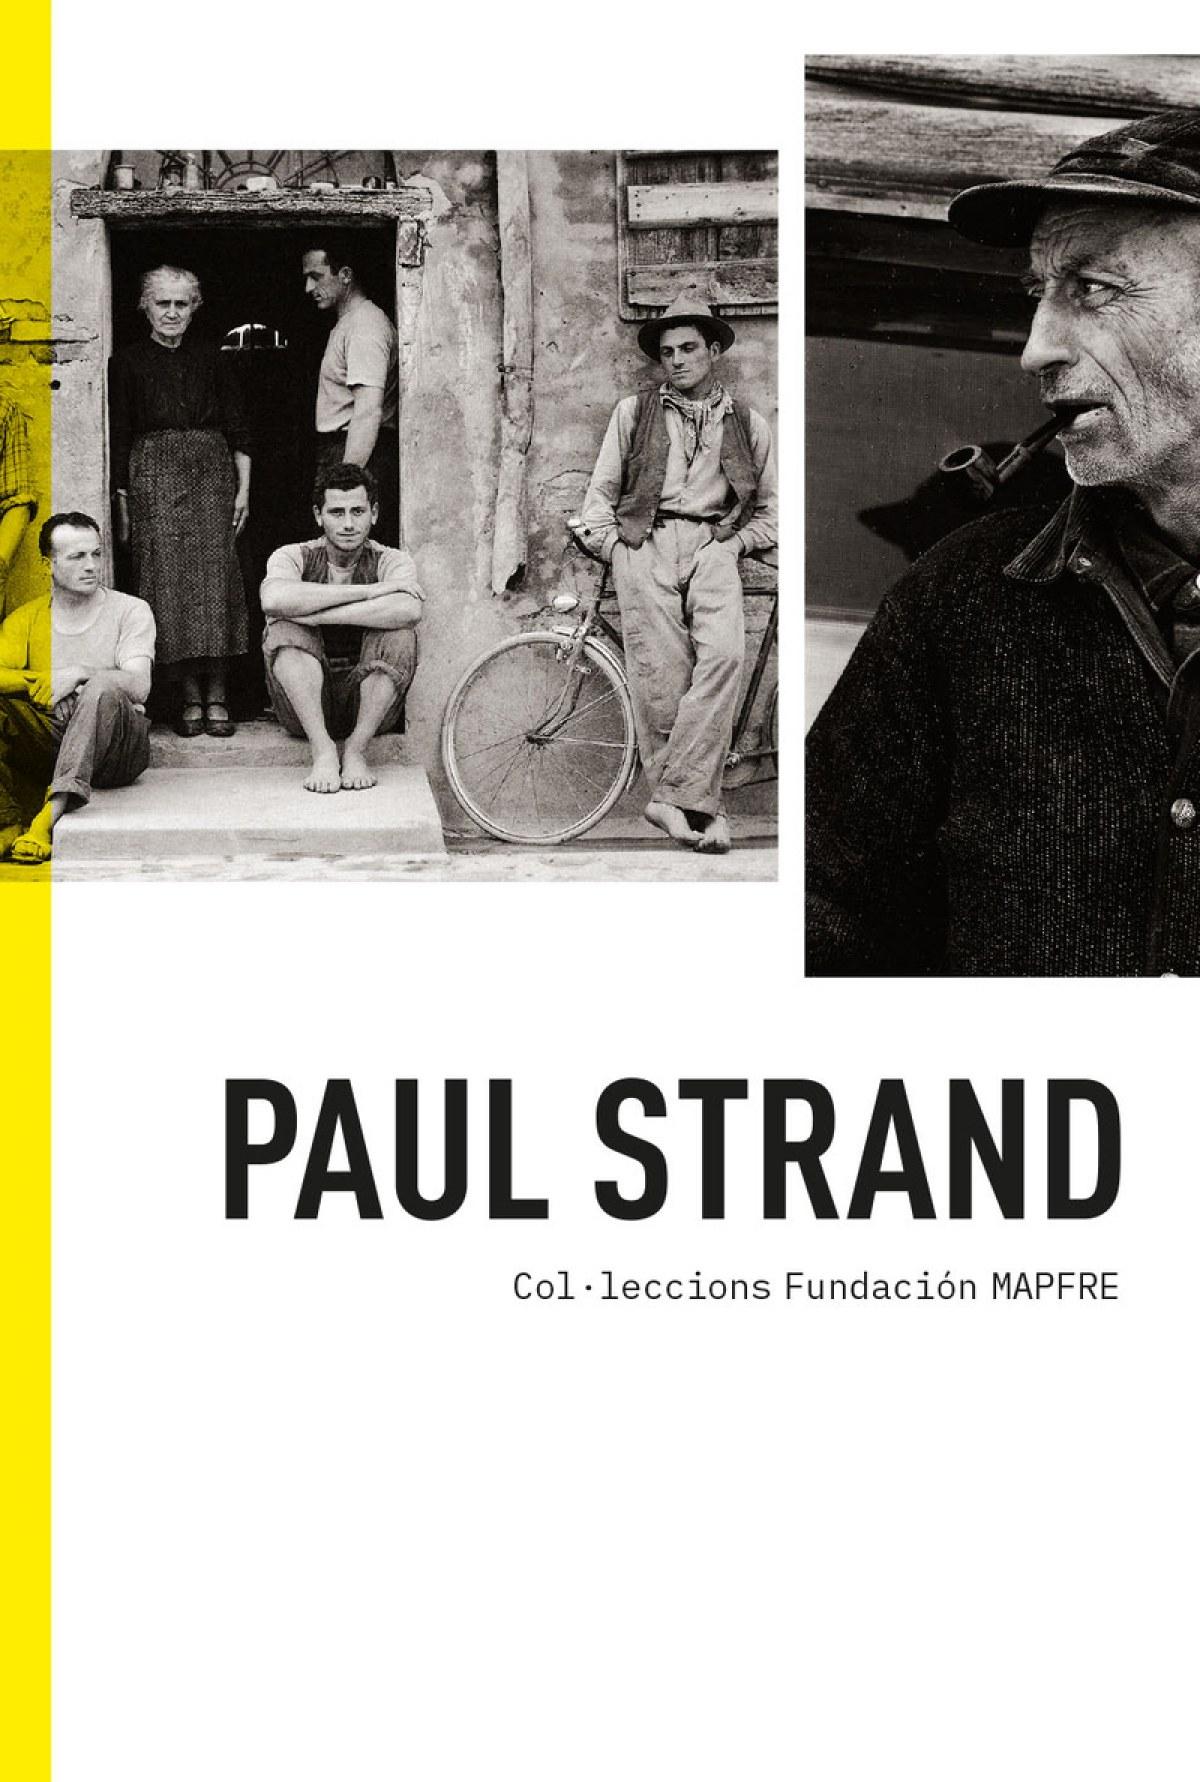 PAUL STRAND - CAT